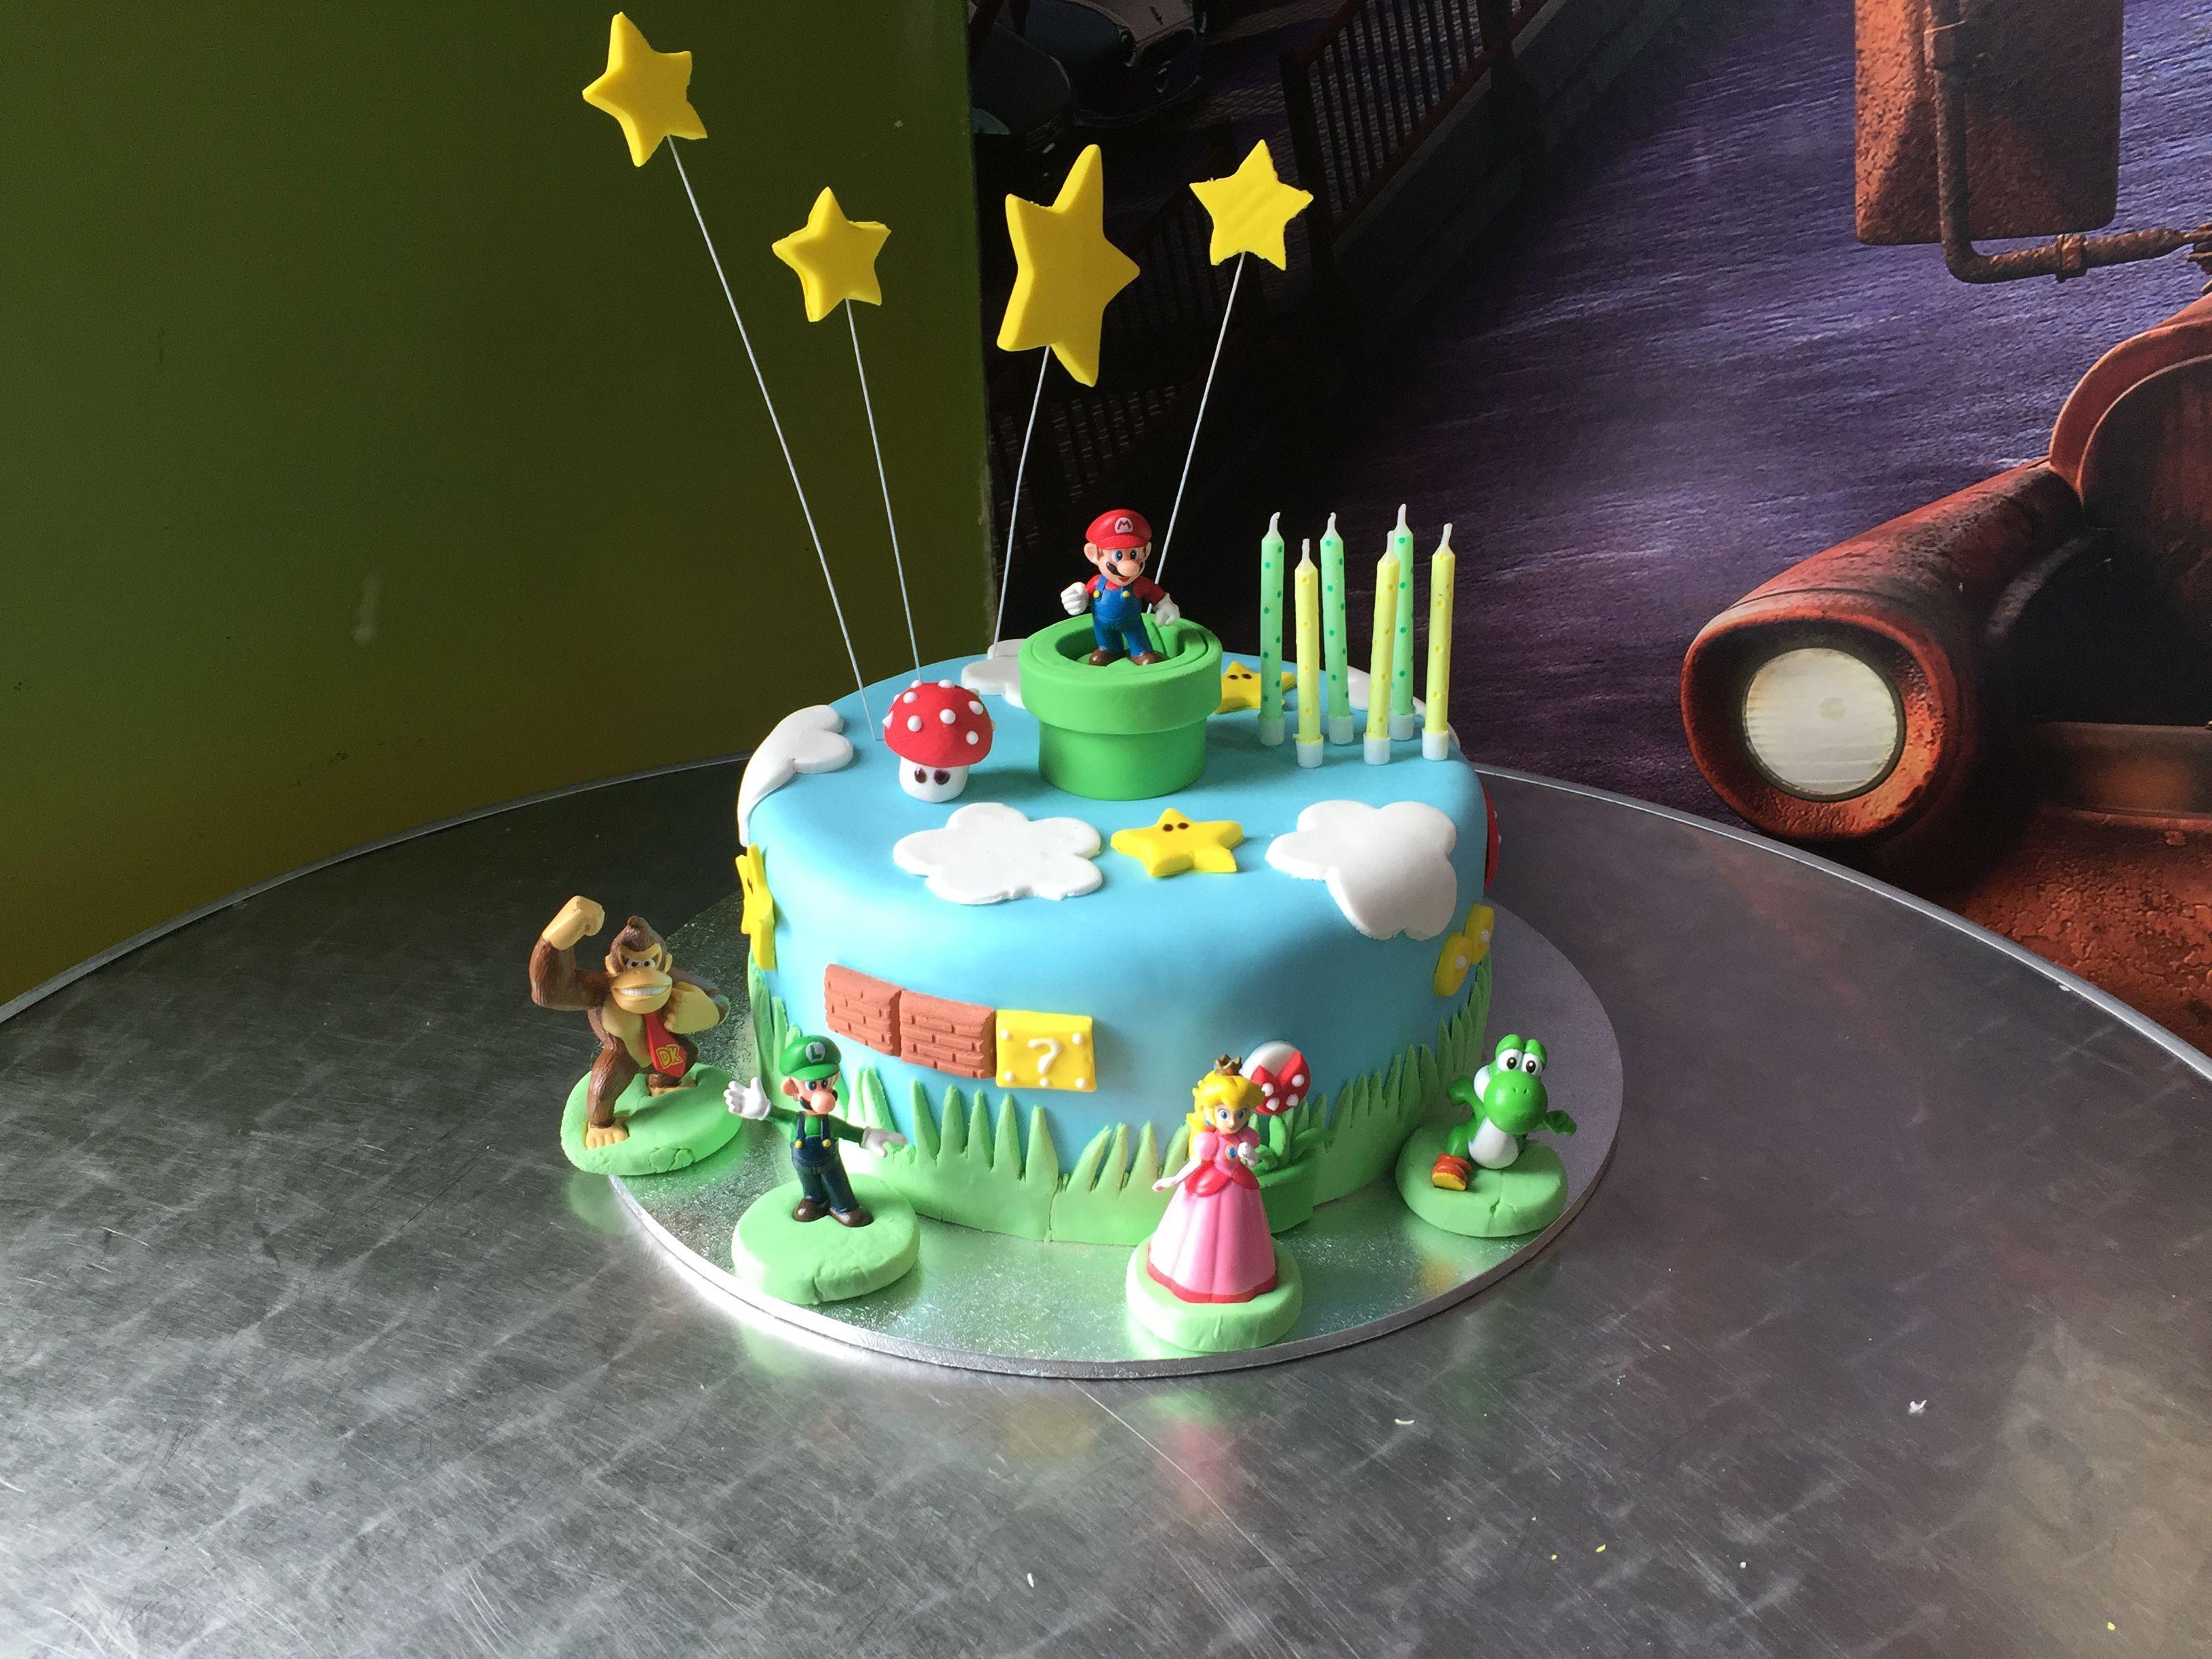 Super Mario Bros cake for Lucas' 6th birthday party